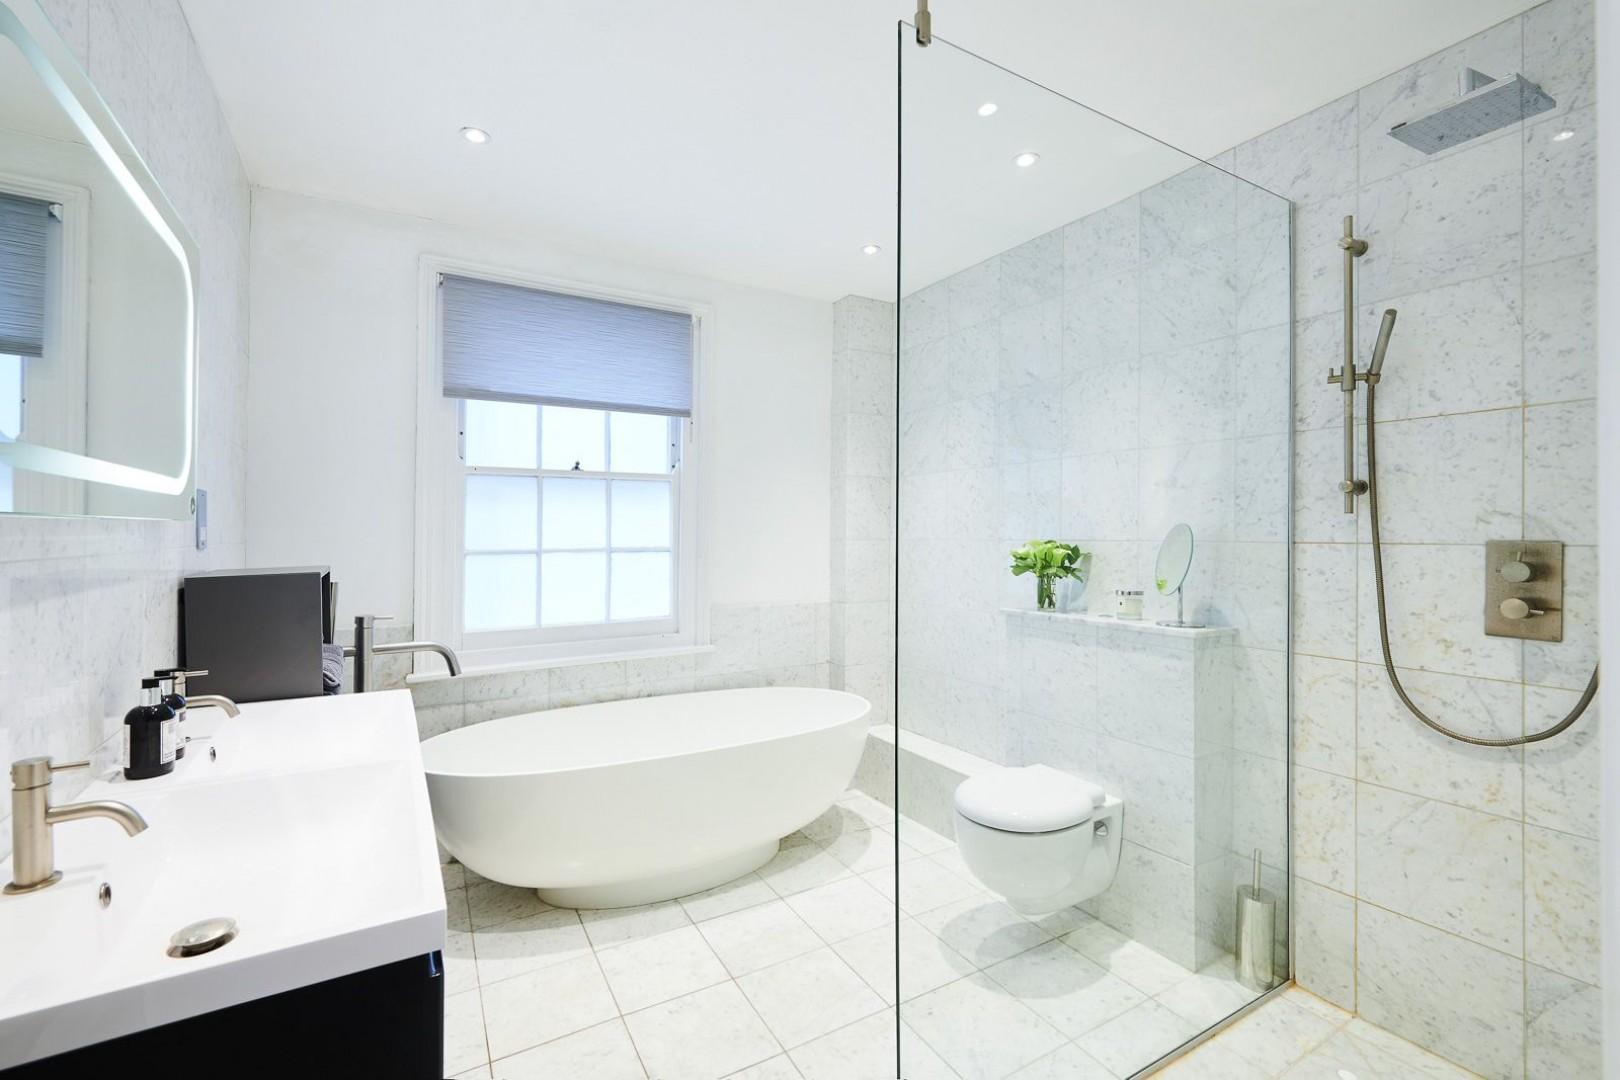 Large en suite bathroom with walk-in shower and bathtub